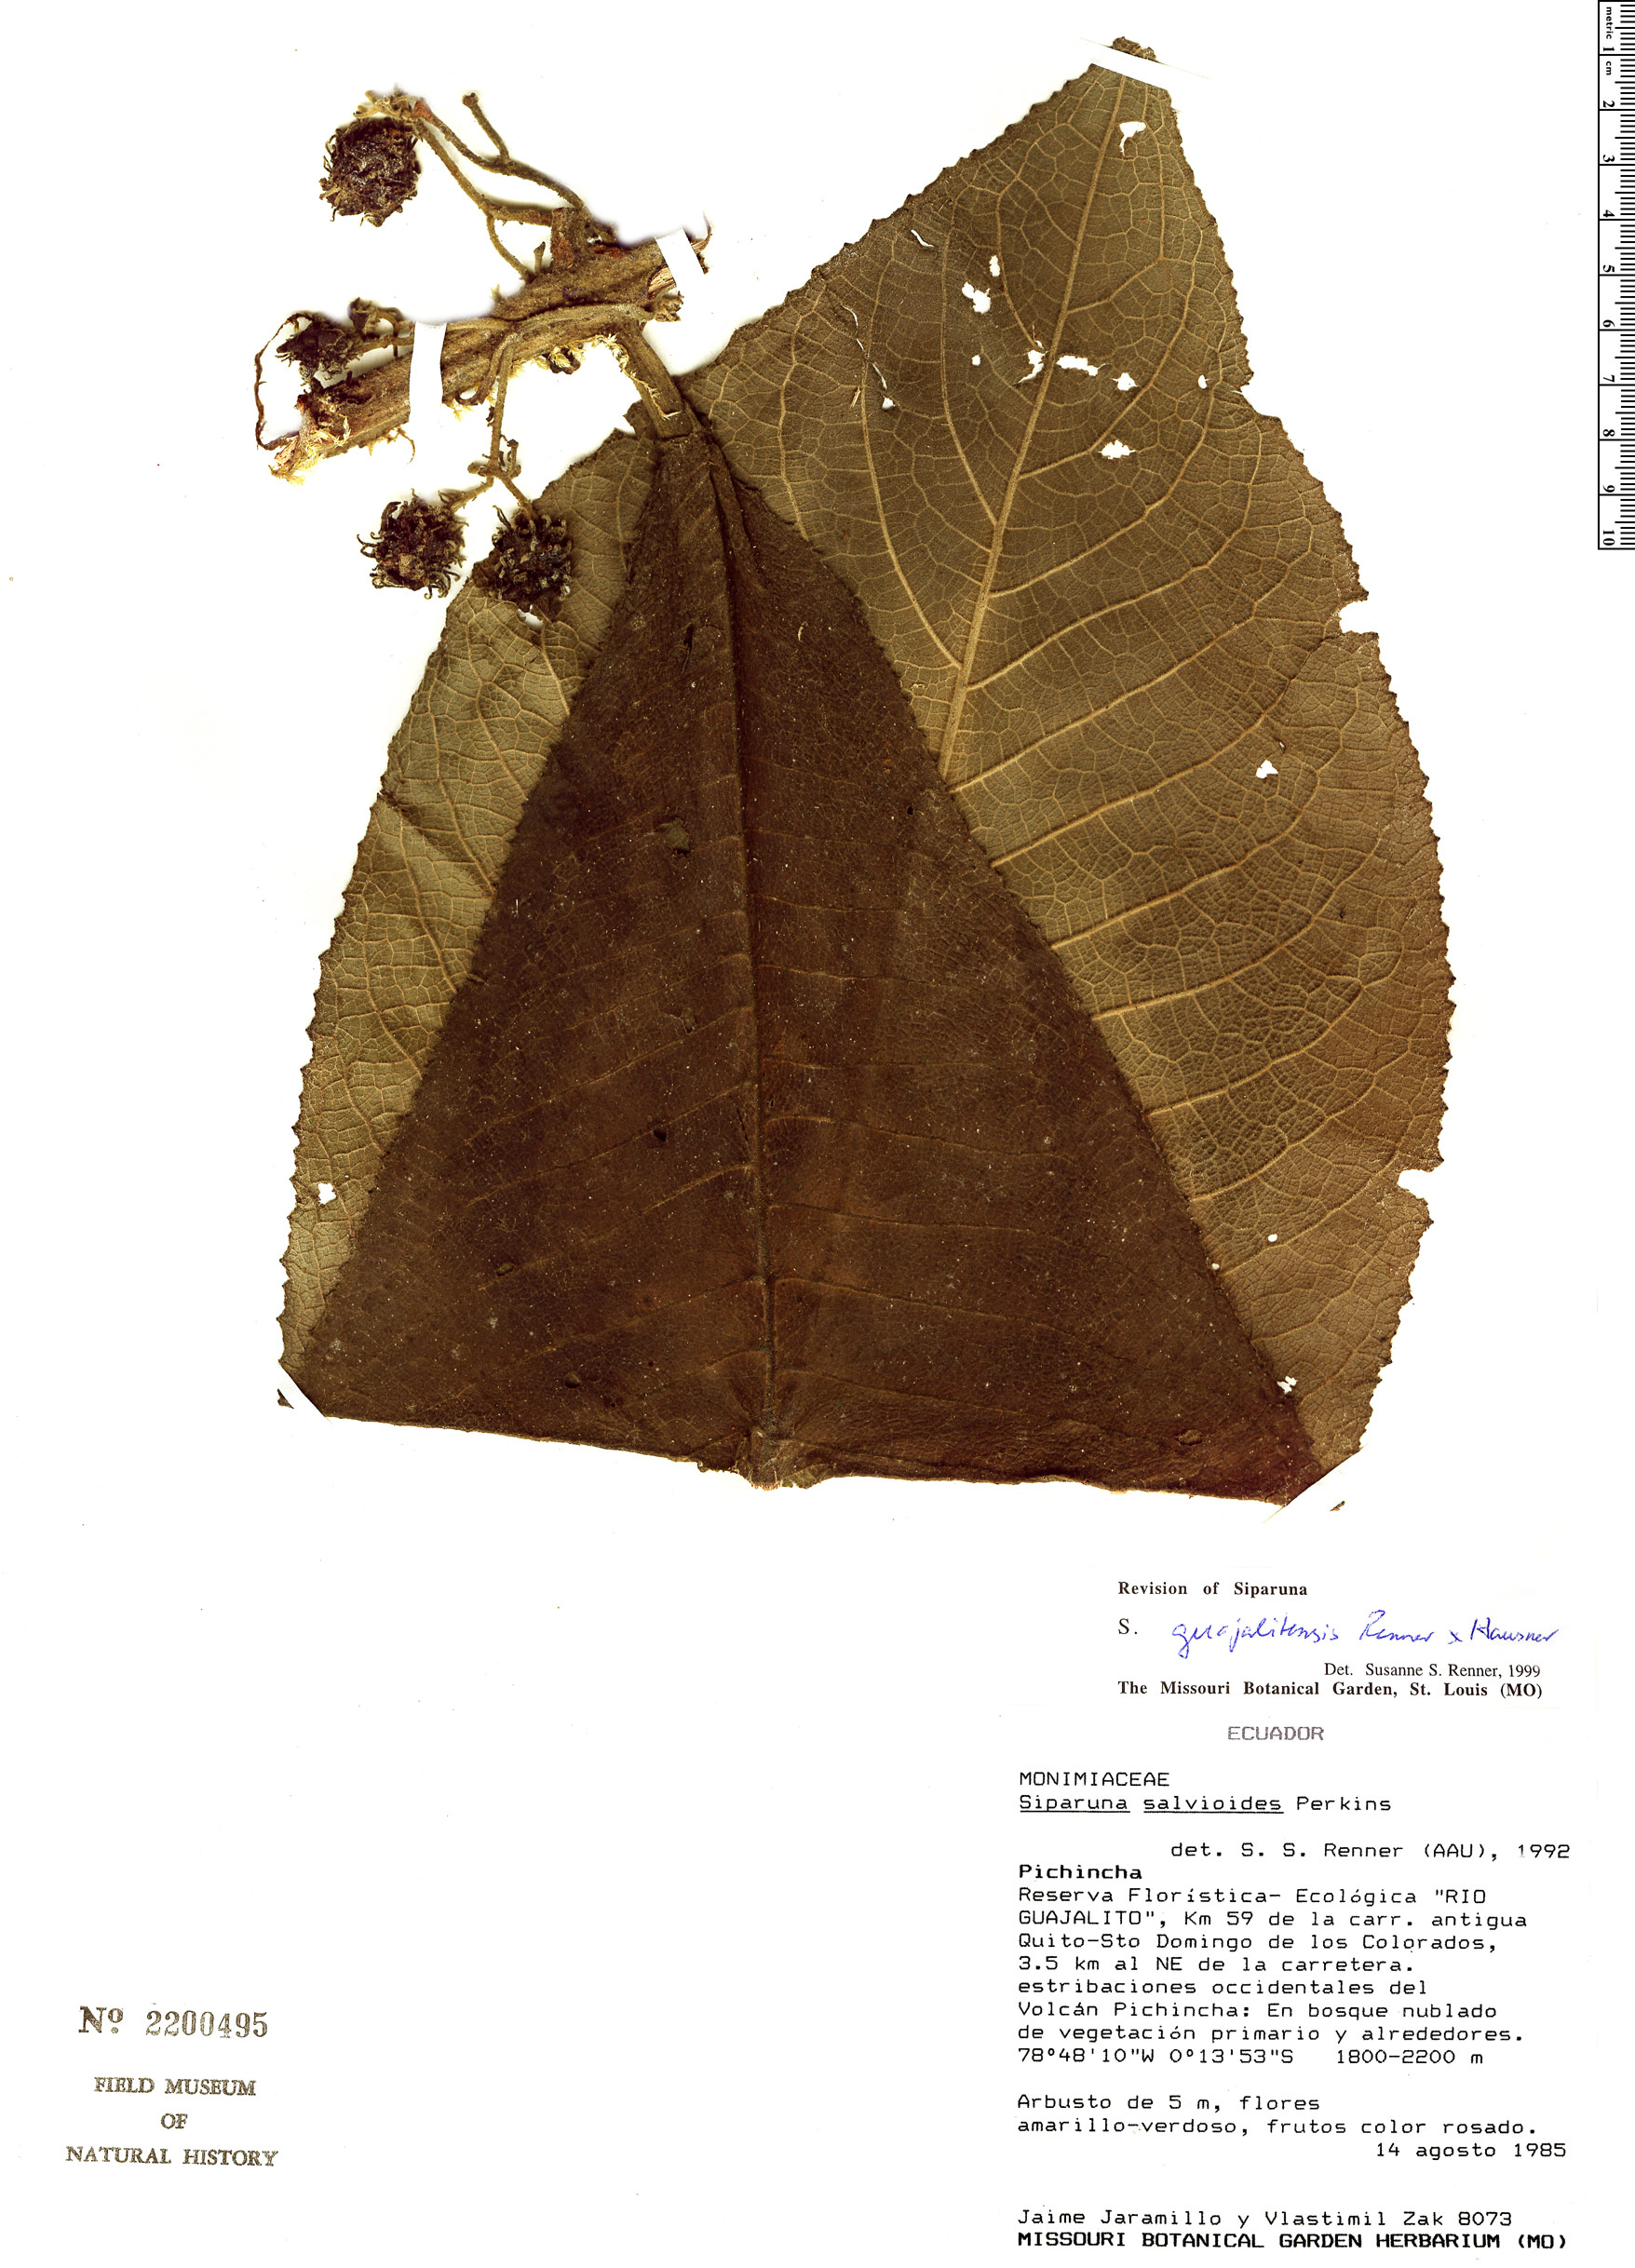 Specimen: Siparuna guajalitensis